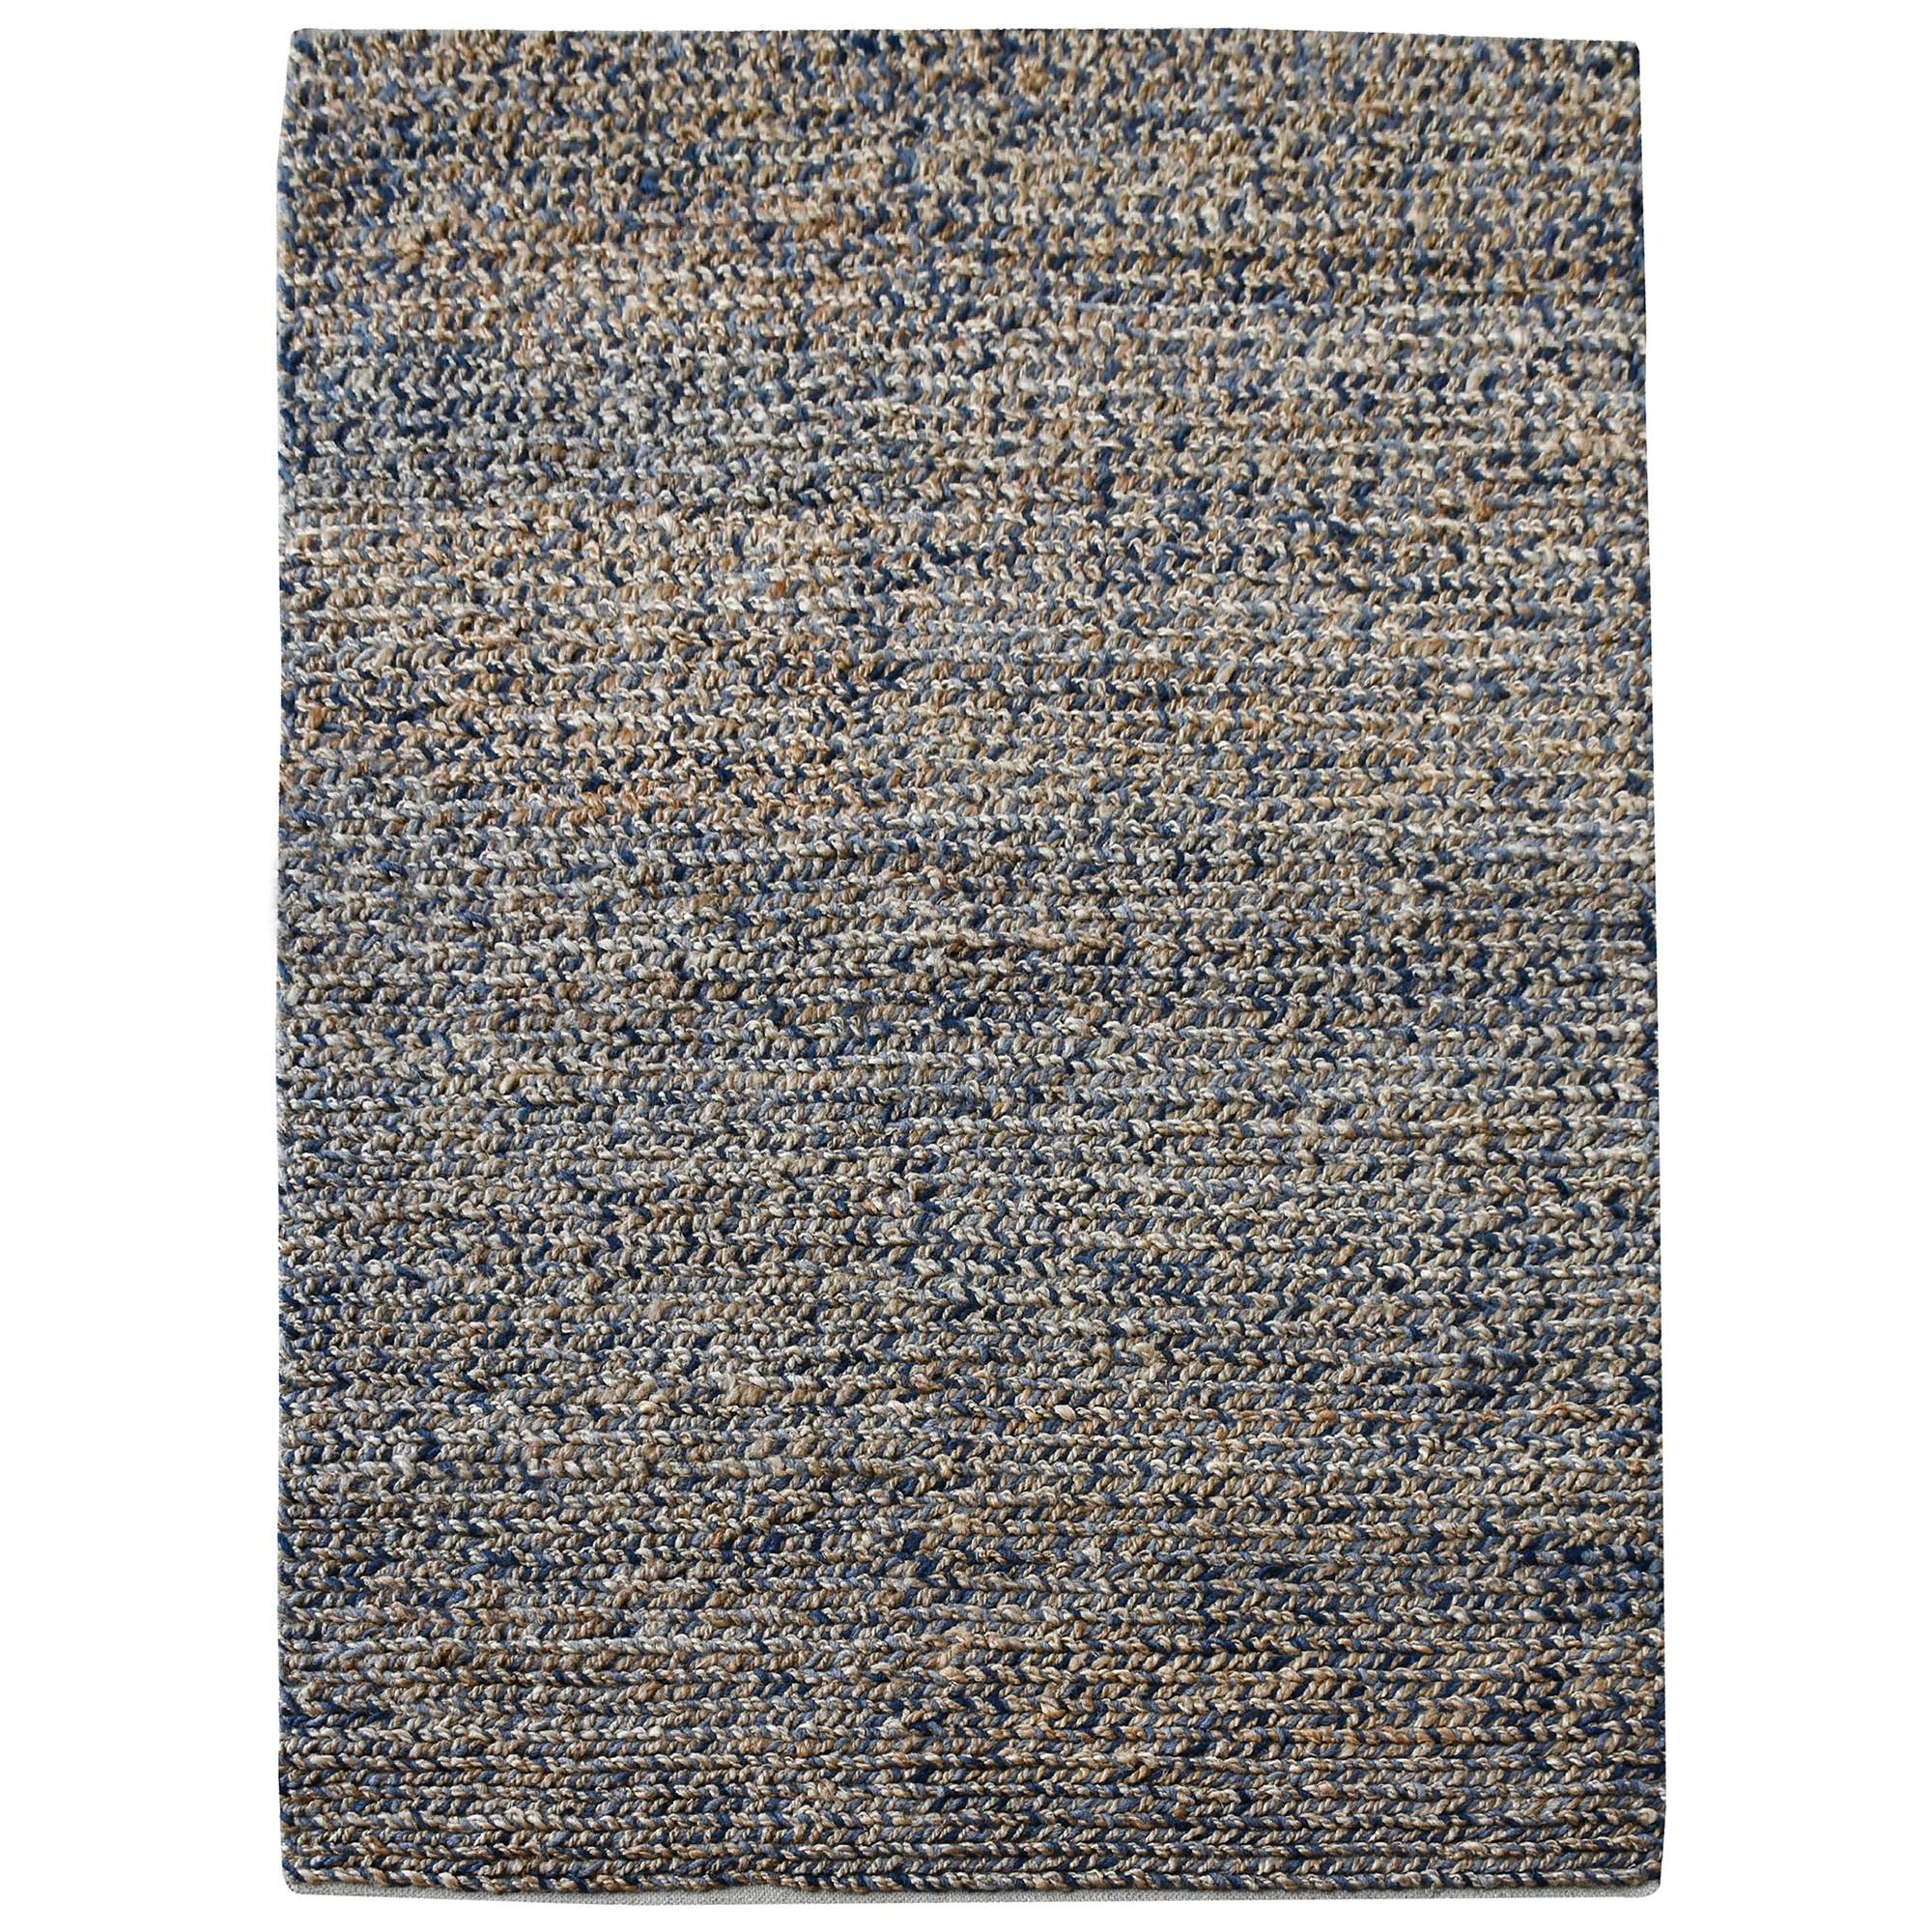 Dormark Handwoven Textured Wool & Hemp Rug, 190x290cm, Blue / Natural